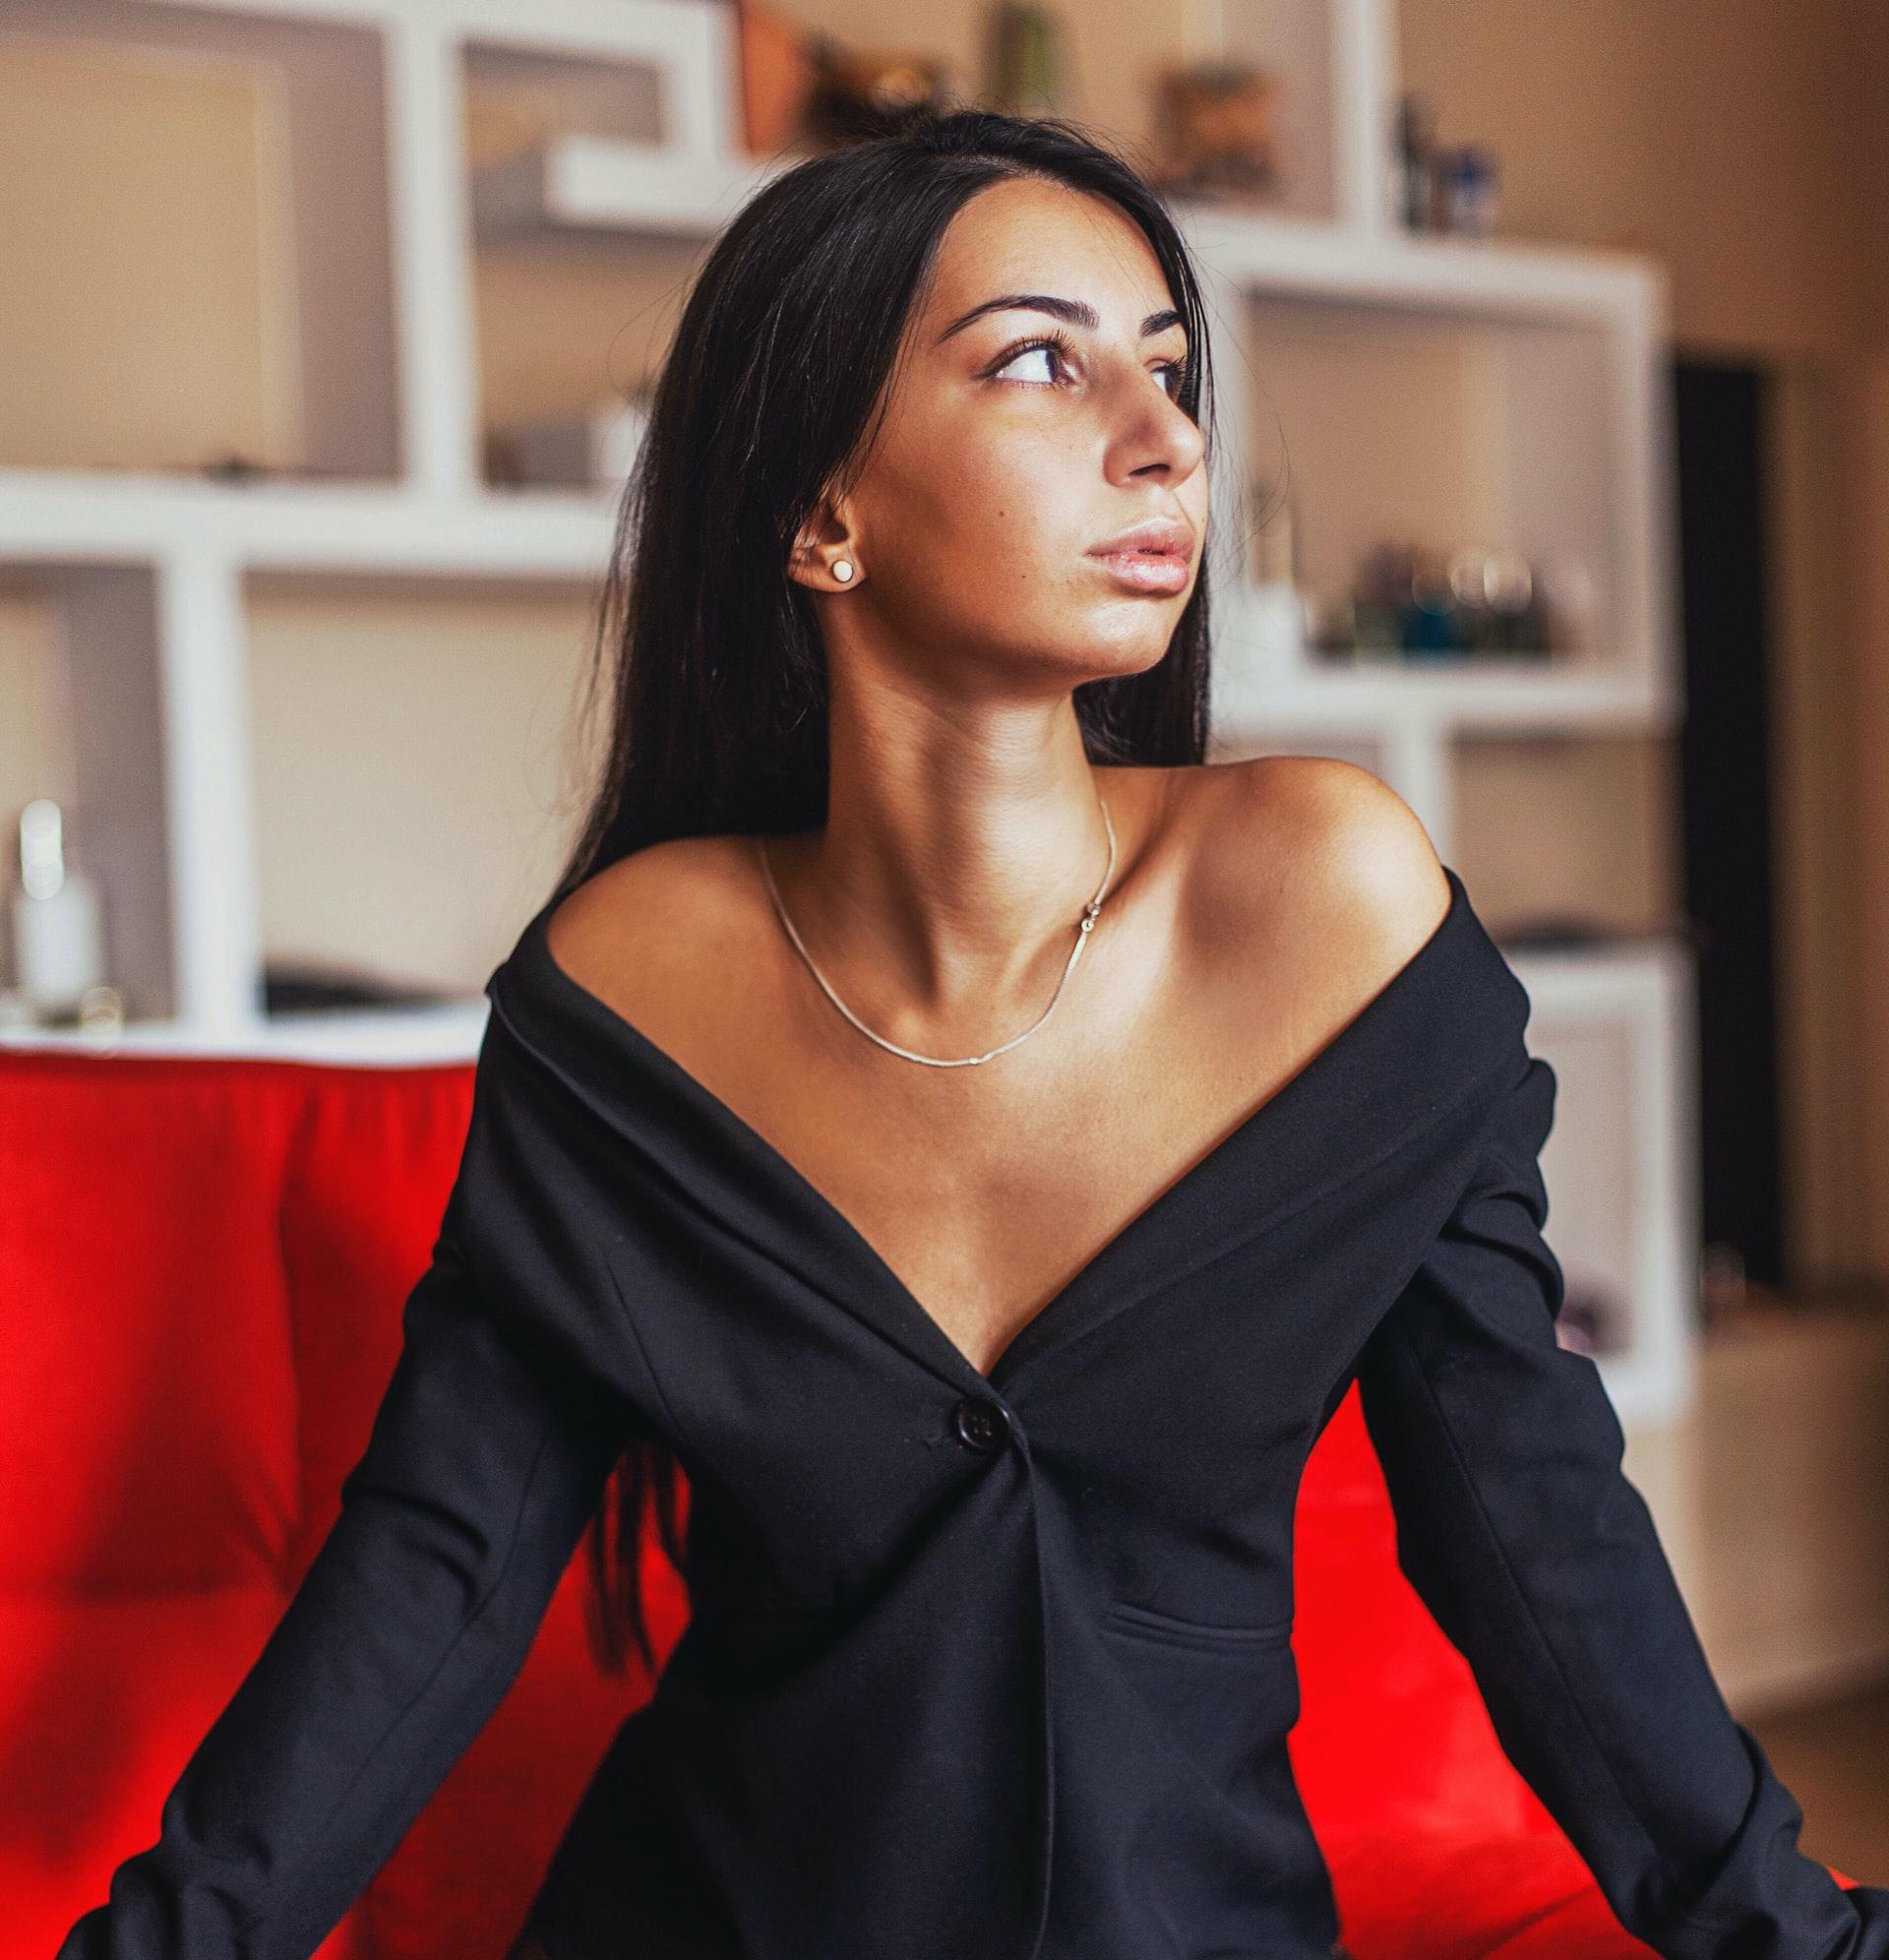 black-dress-women